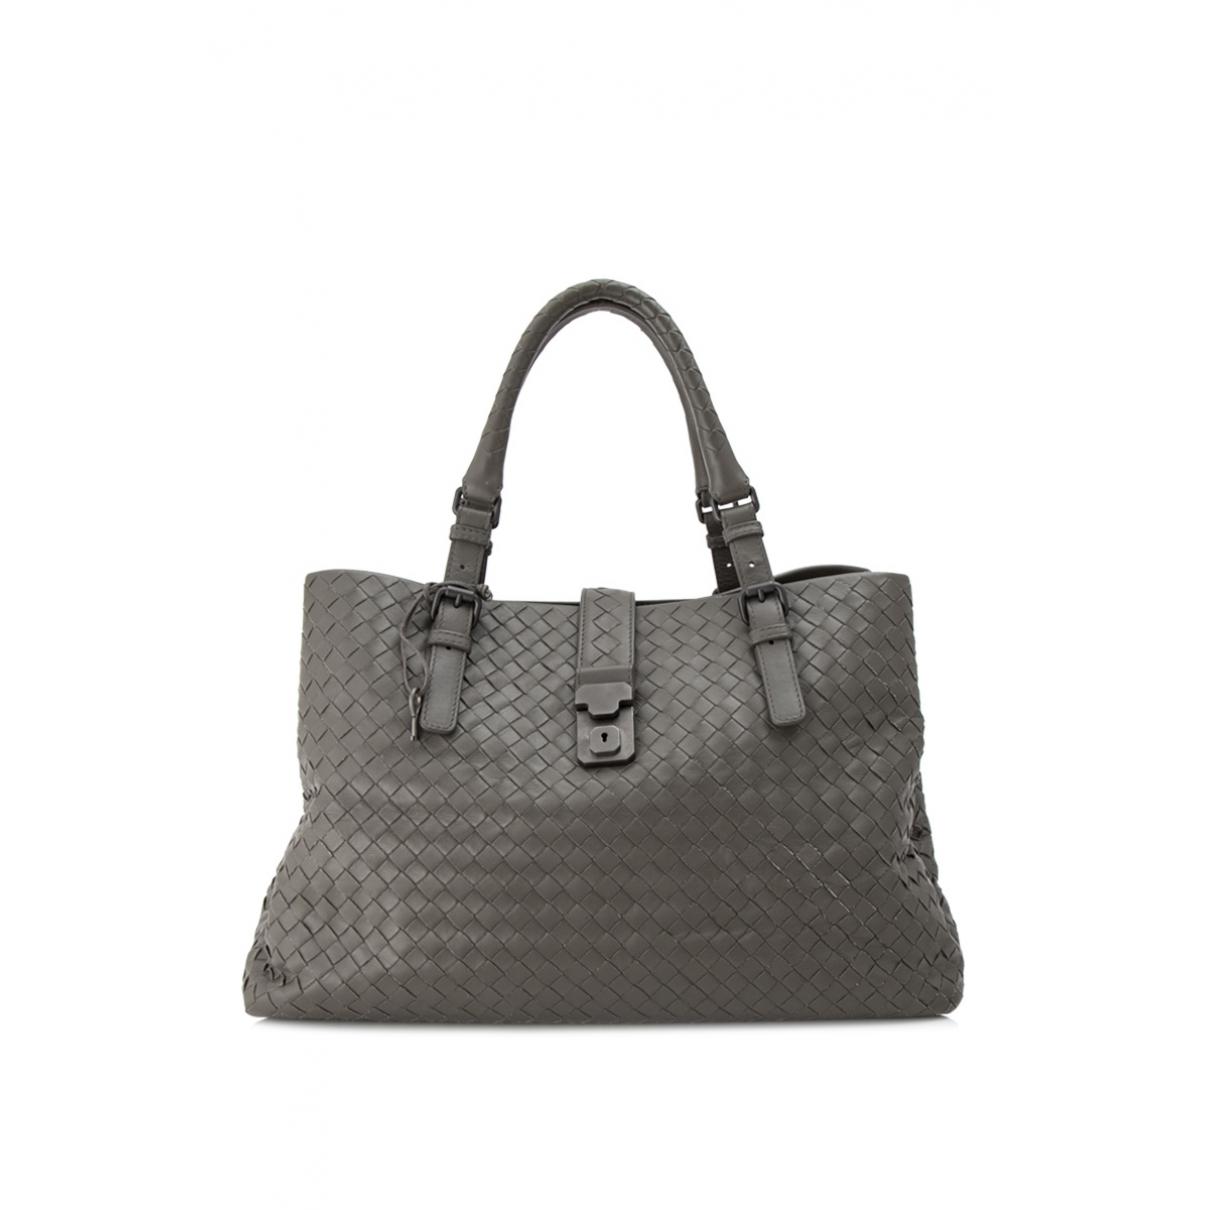 Bottega Veneta Roma Grey Leather handbag for Women \N